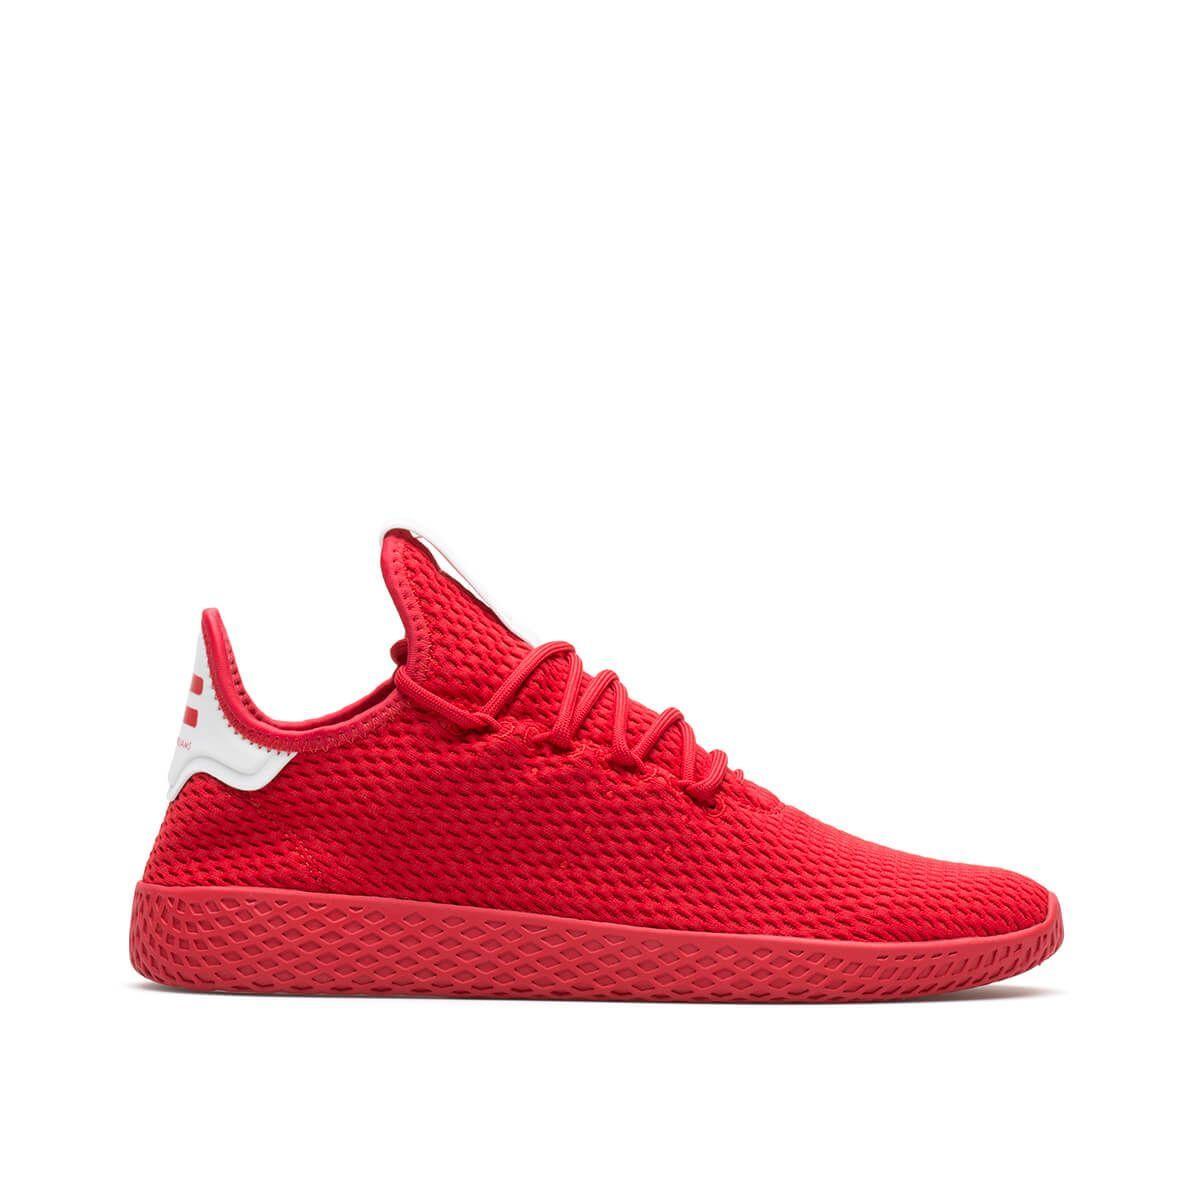 Adidas Originals Pw Tennis Hu In Red